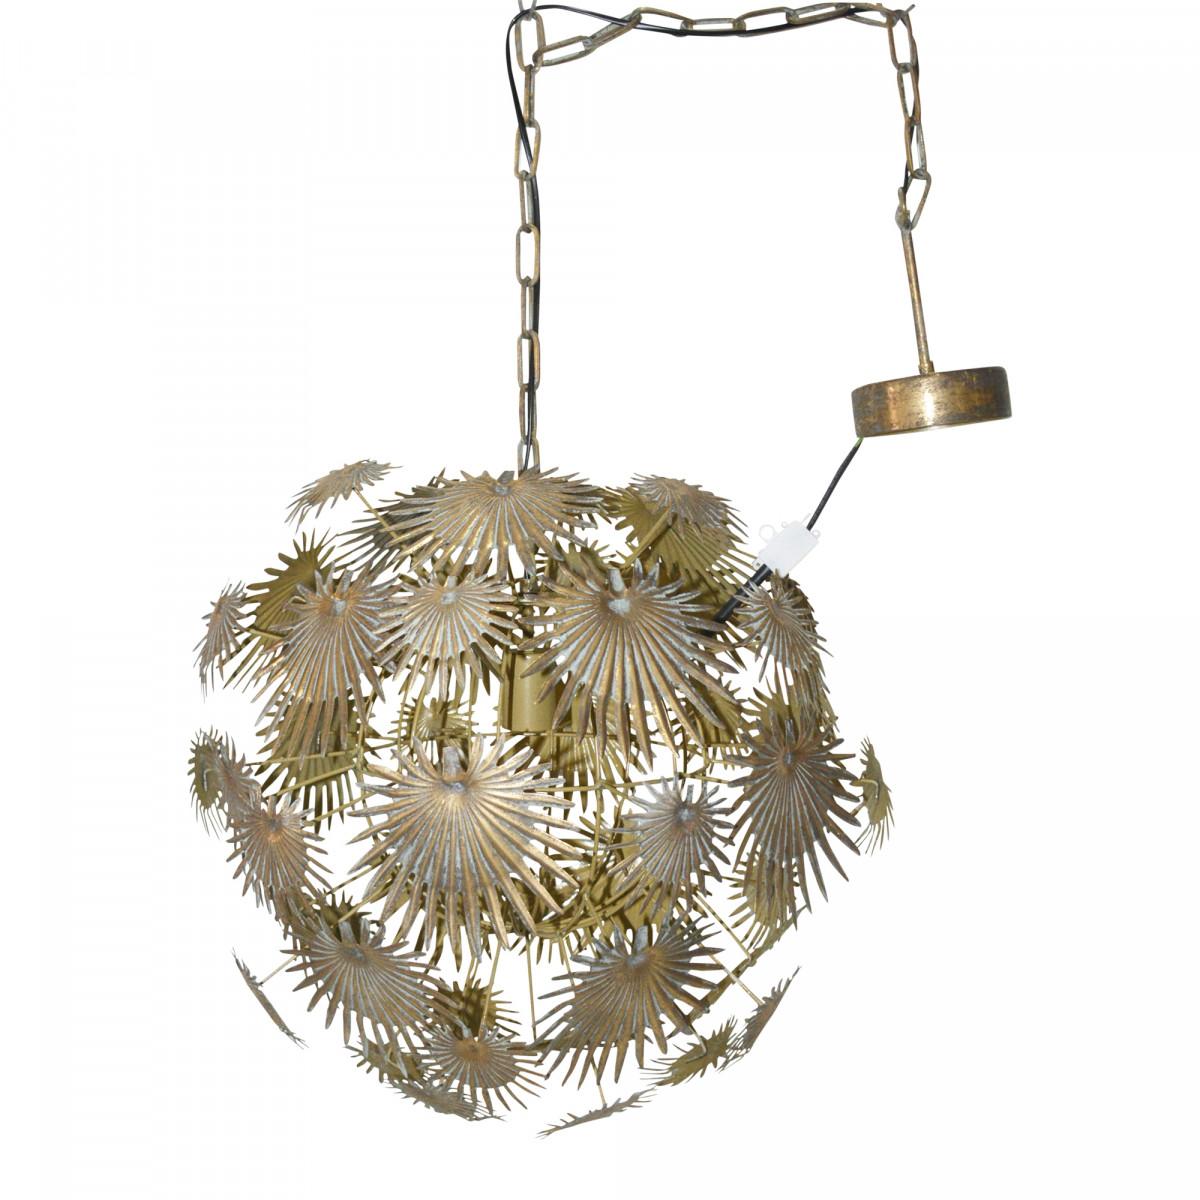 PTMD Bexley Gold hanglamp bloemen groot large hanglamp vintage industriel